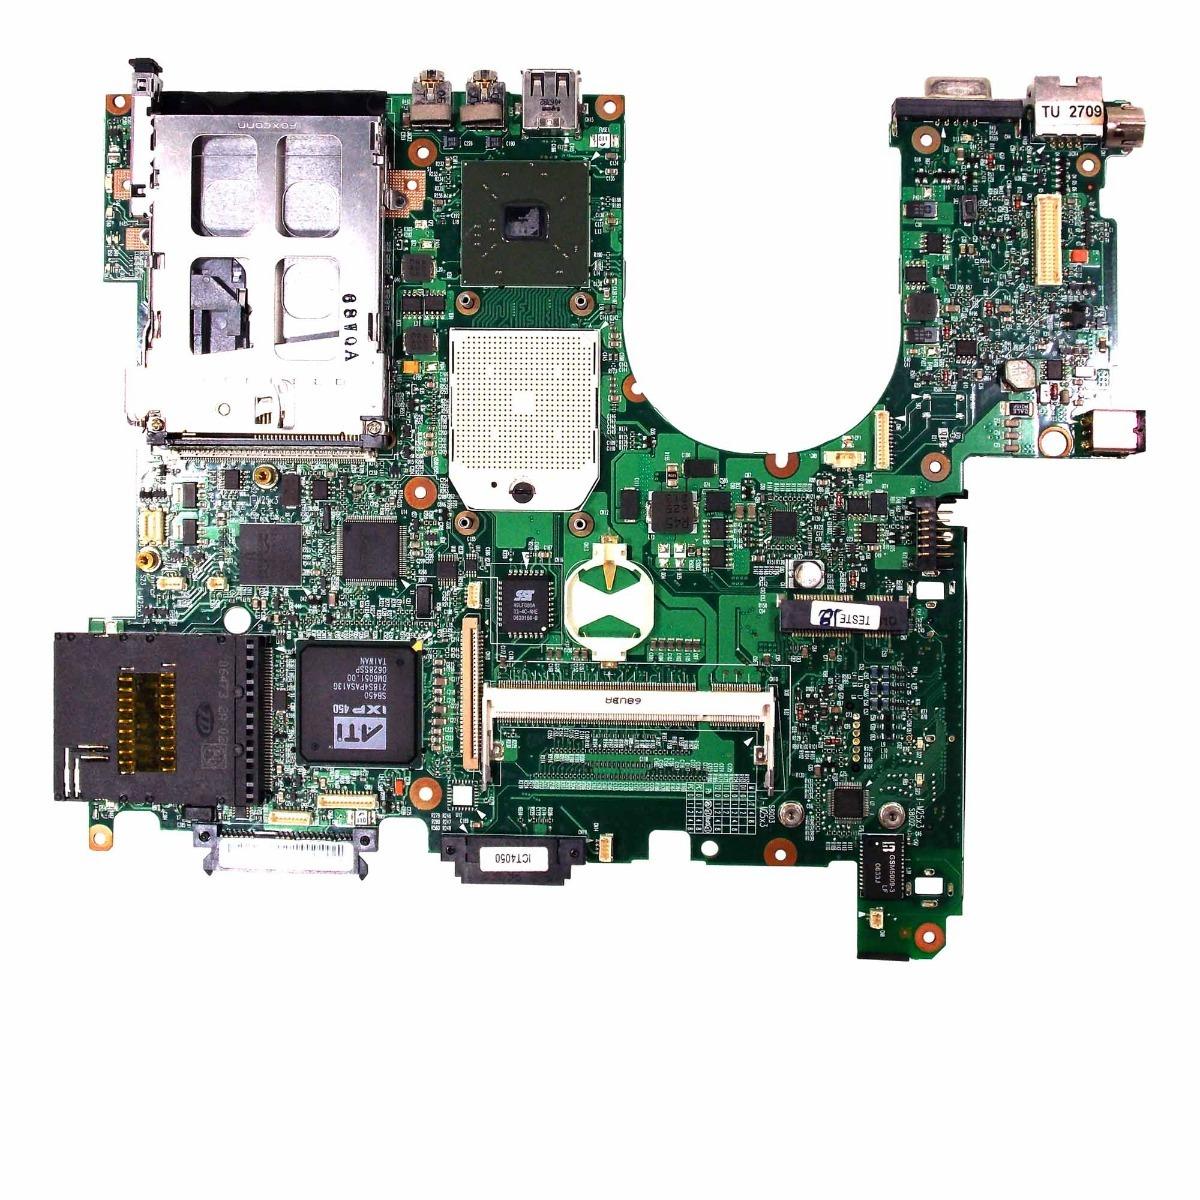 COMPAQ NX6320 MOTHERBOARD DRIVER WINDOWS XP